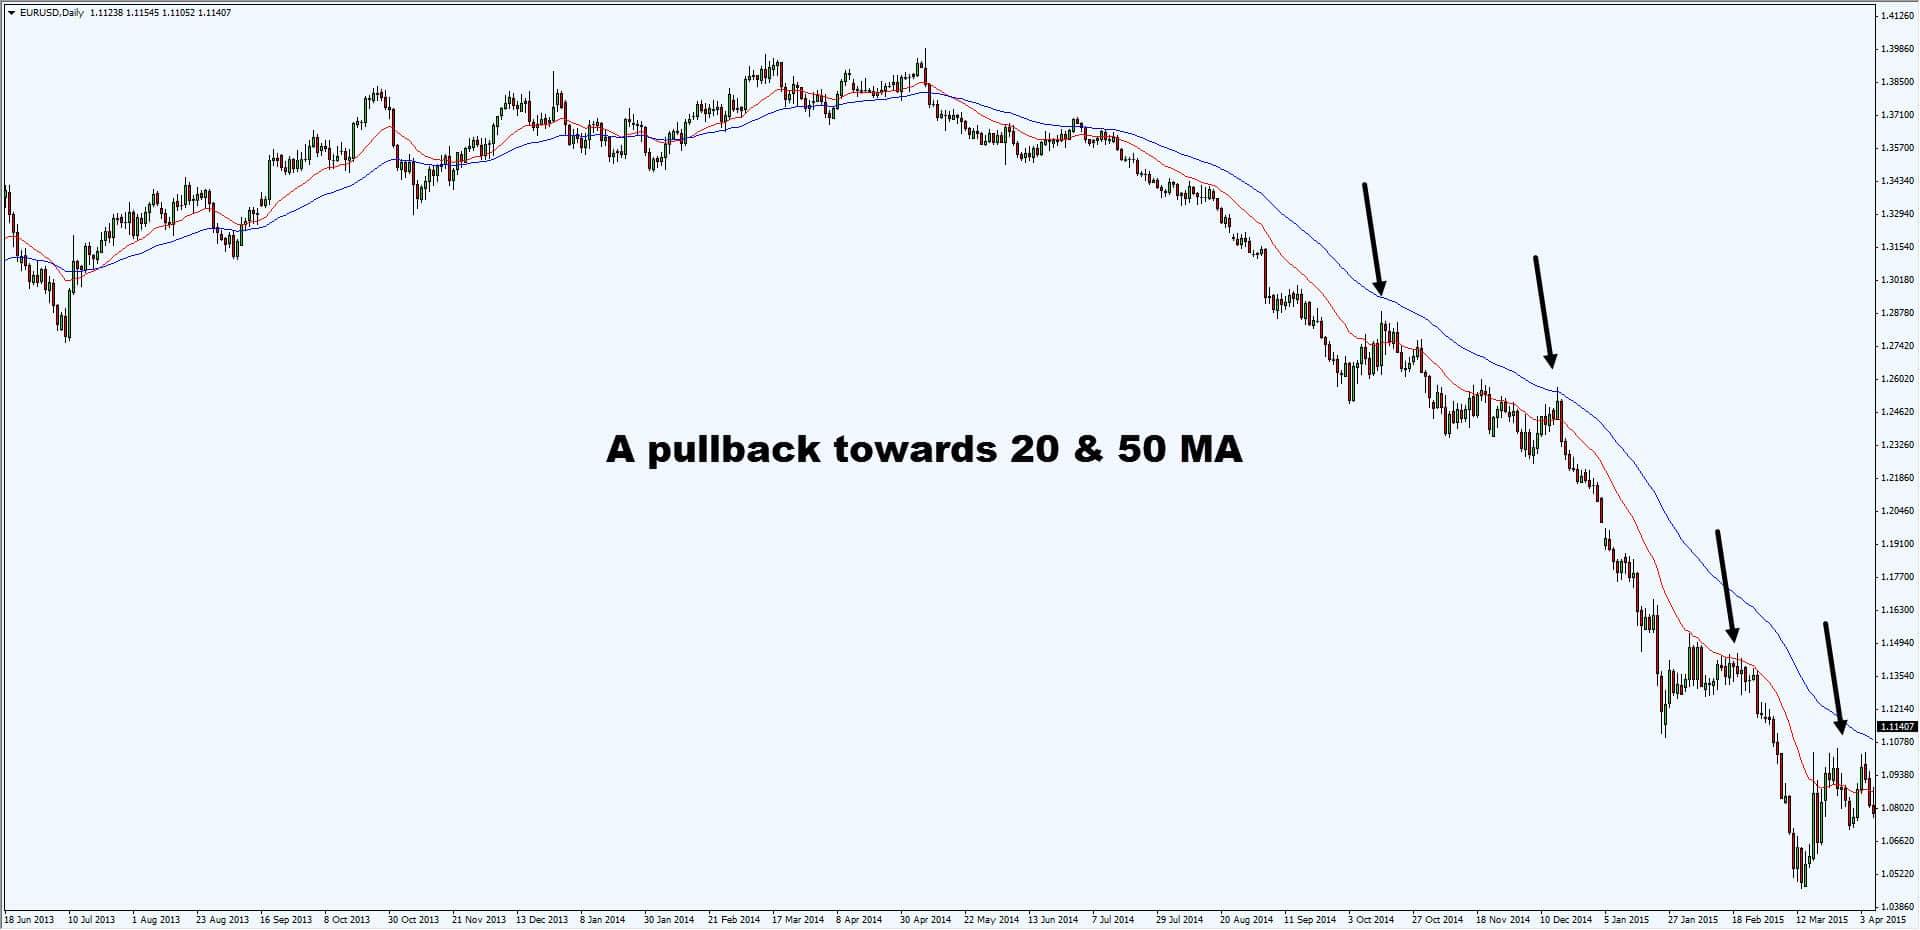 Swing trading pullback strategy